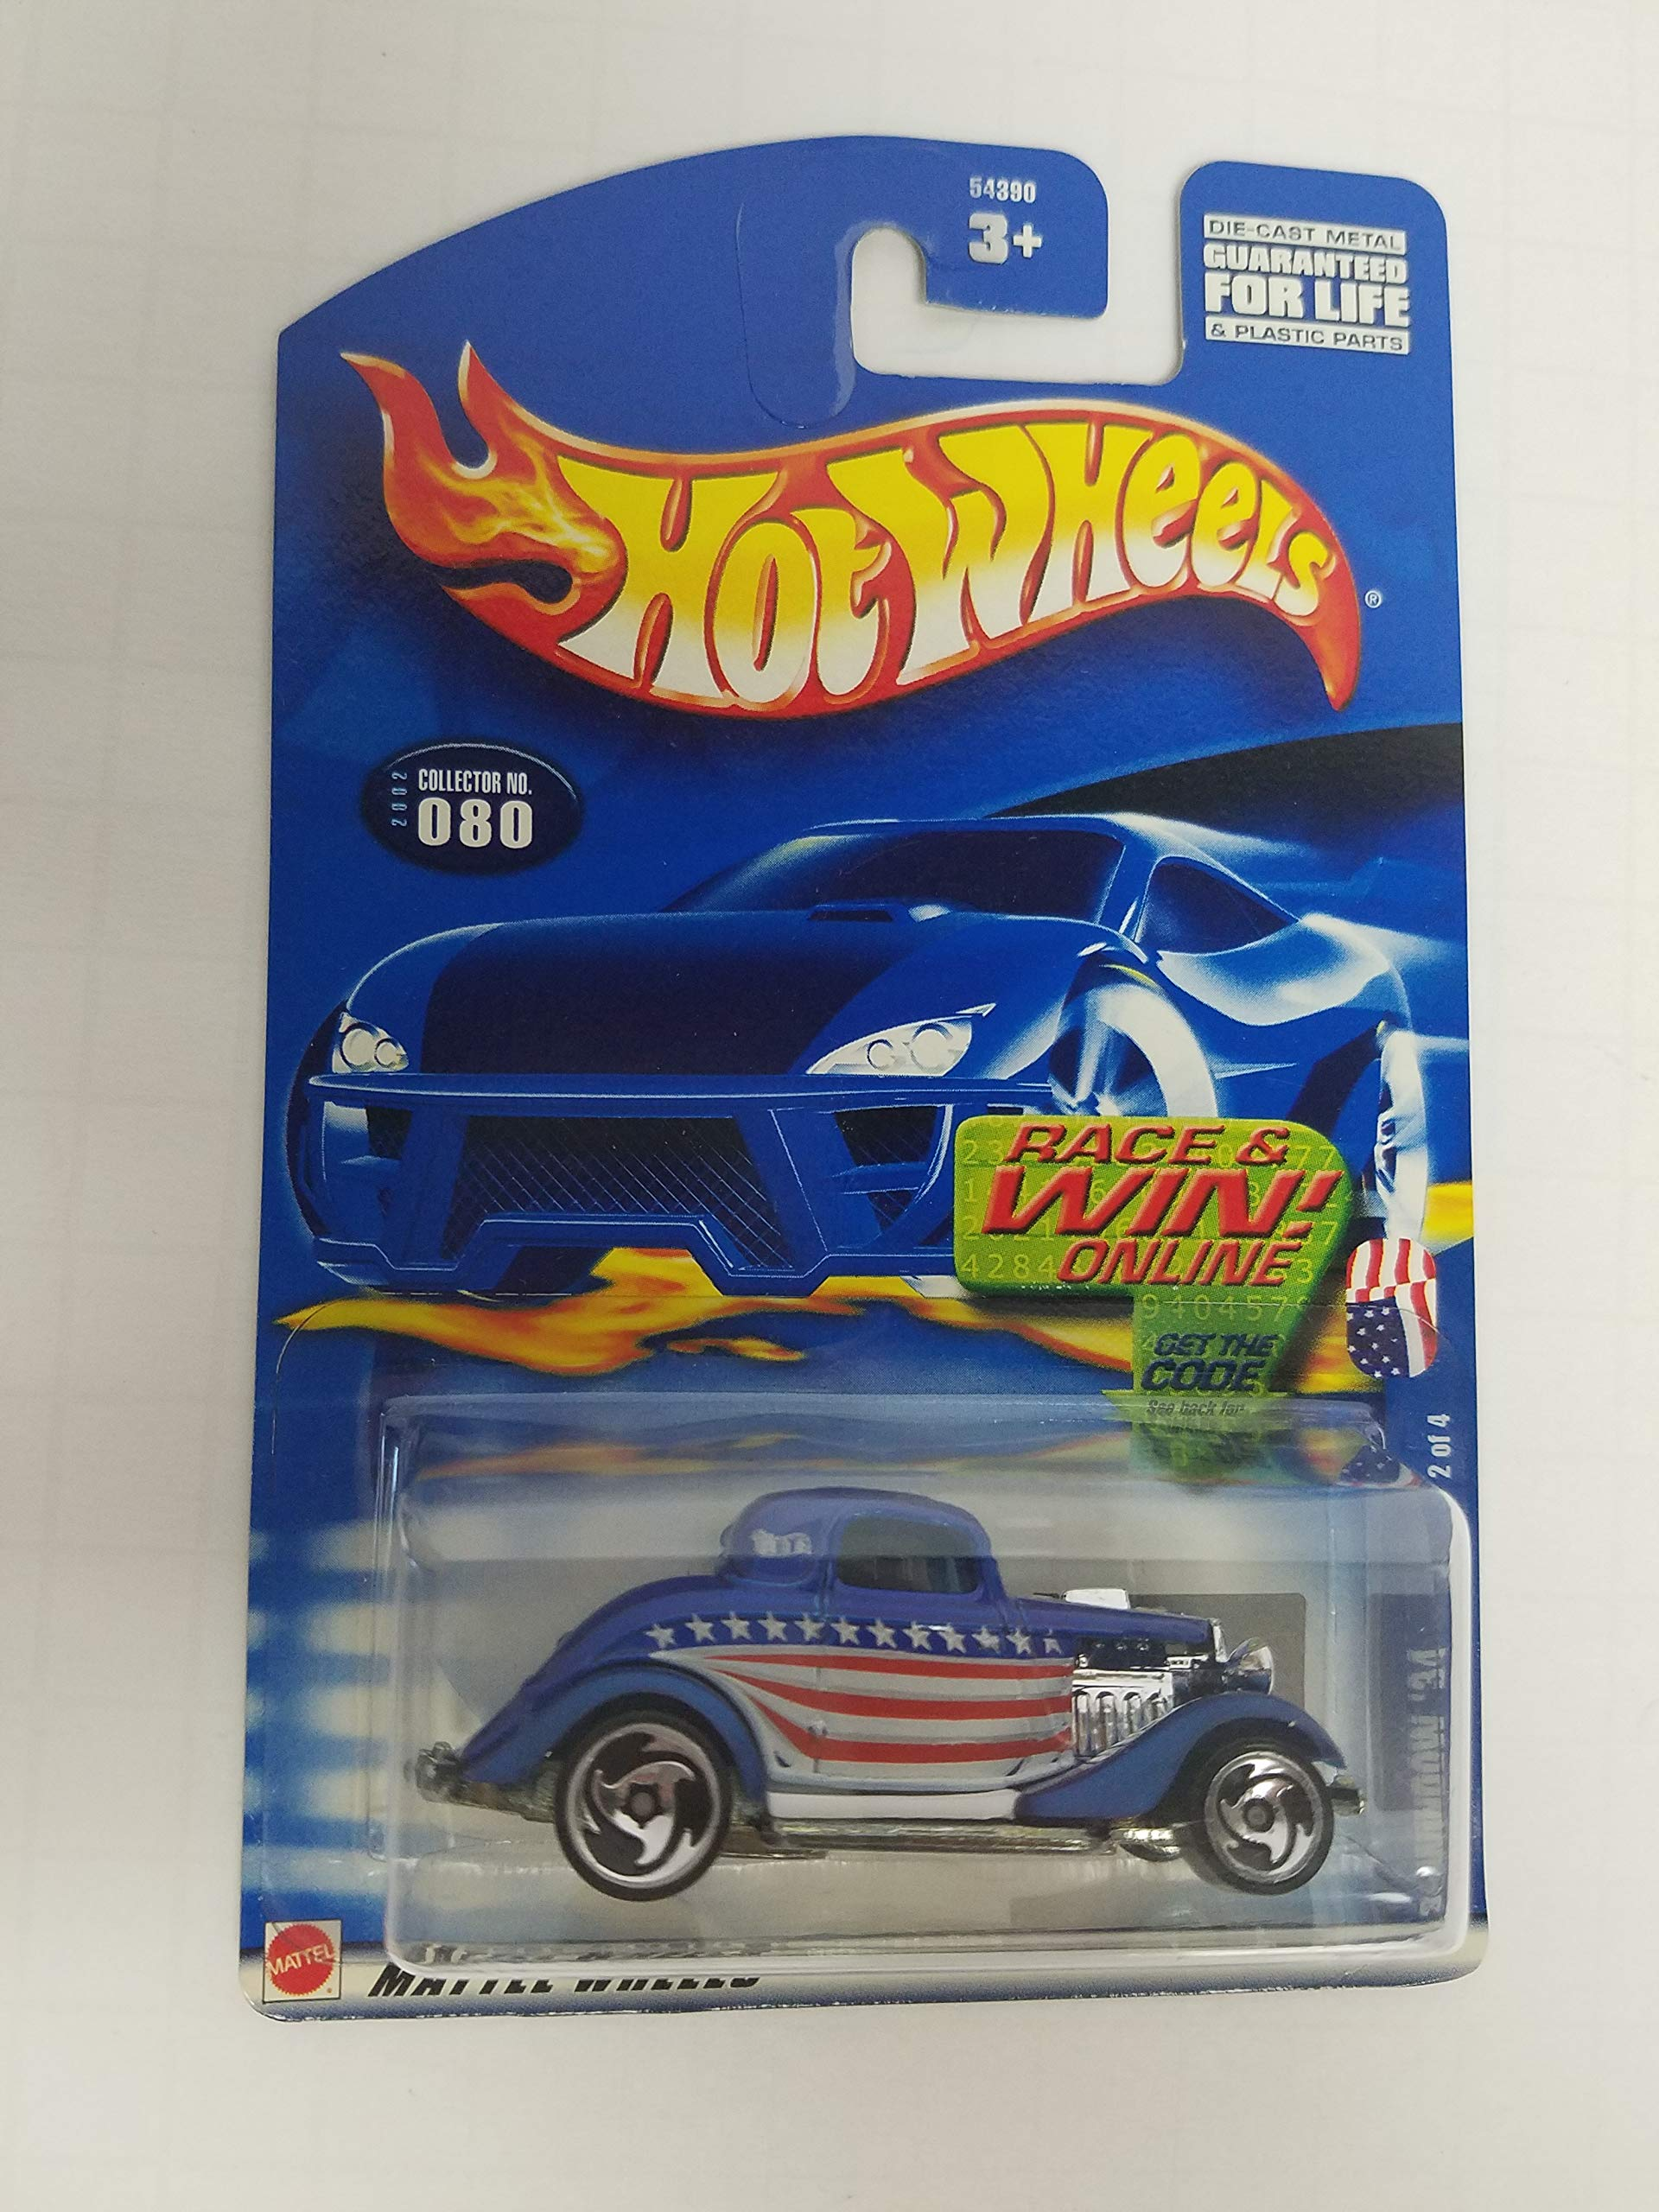 3 Window '34 Hot Wheels 2002 diecast 1/64 scale car No. 080